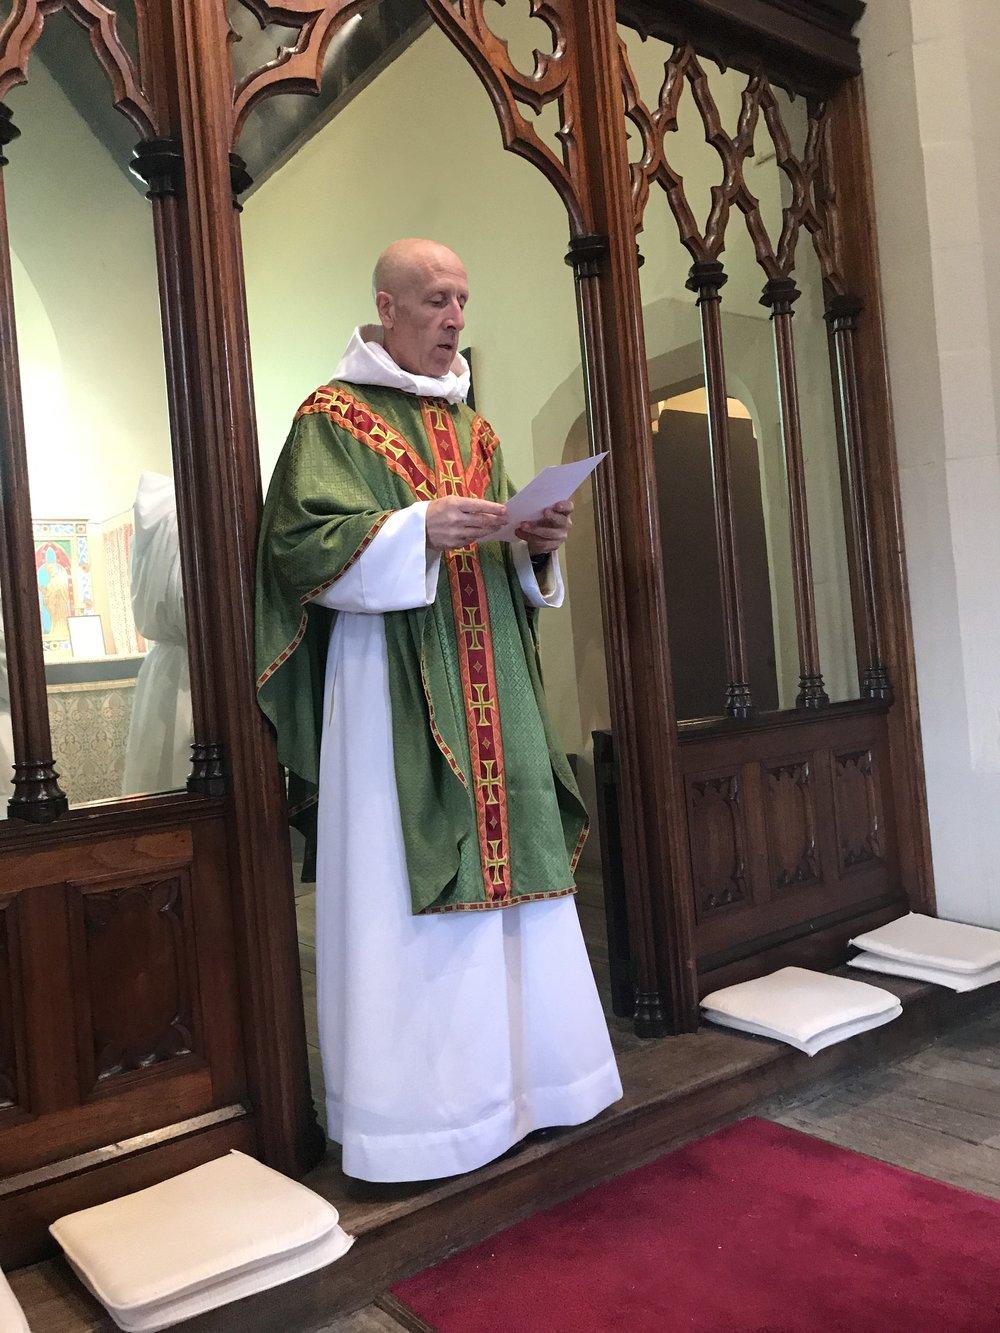 Fr Bachmann preaching at Sunday Missa Cantata